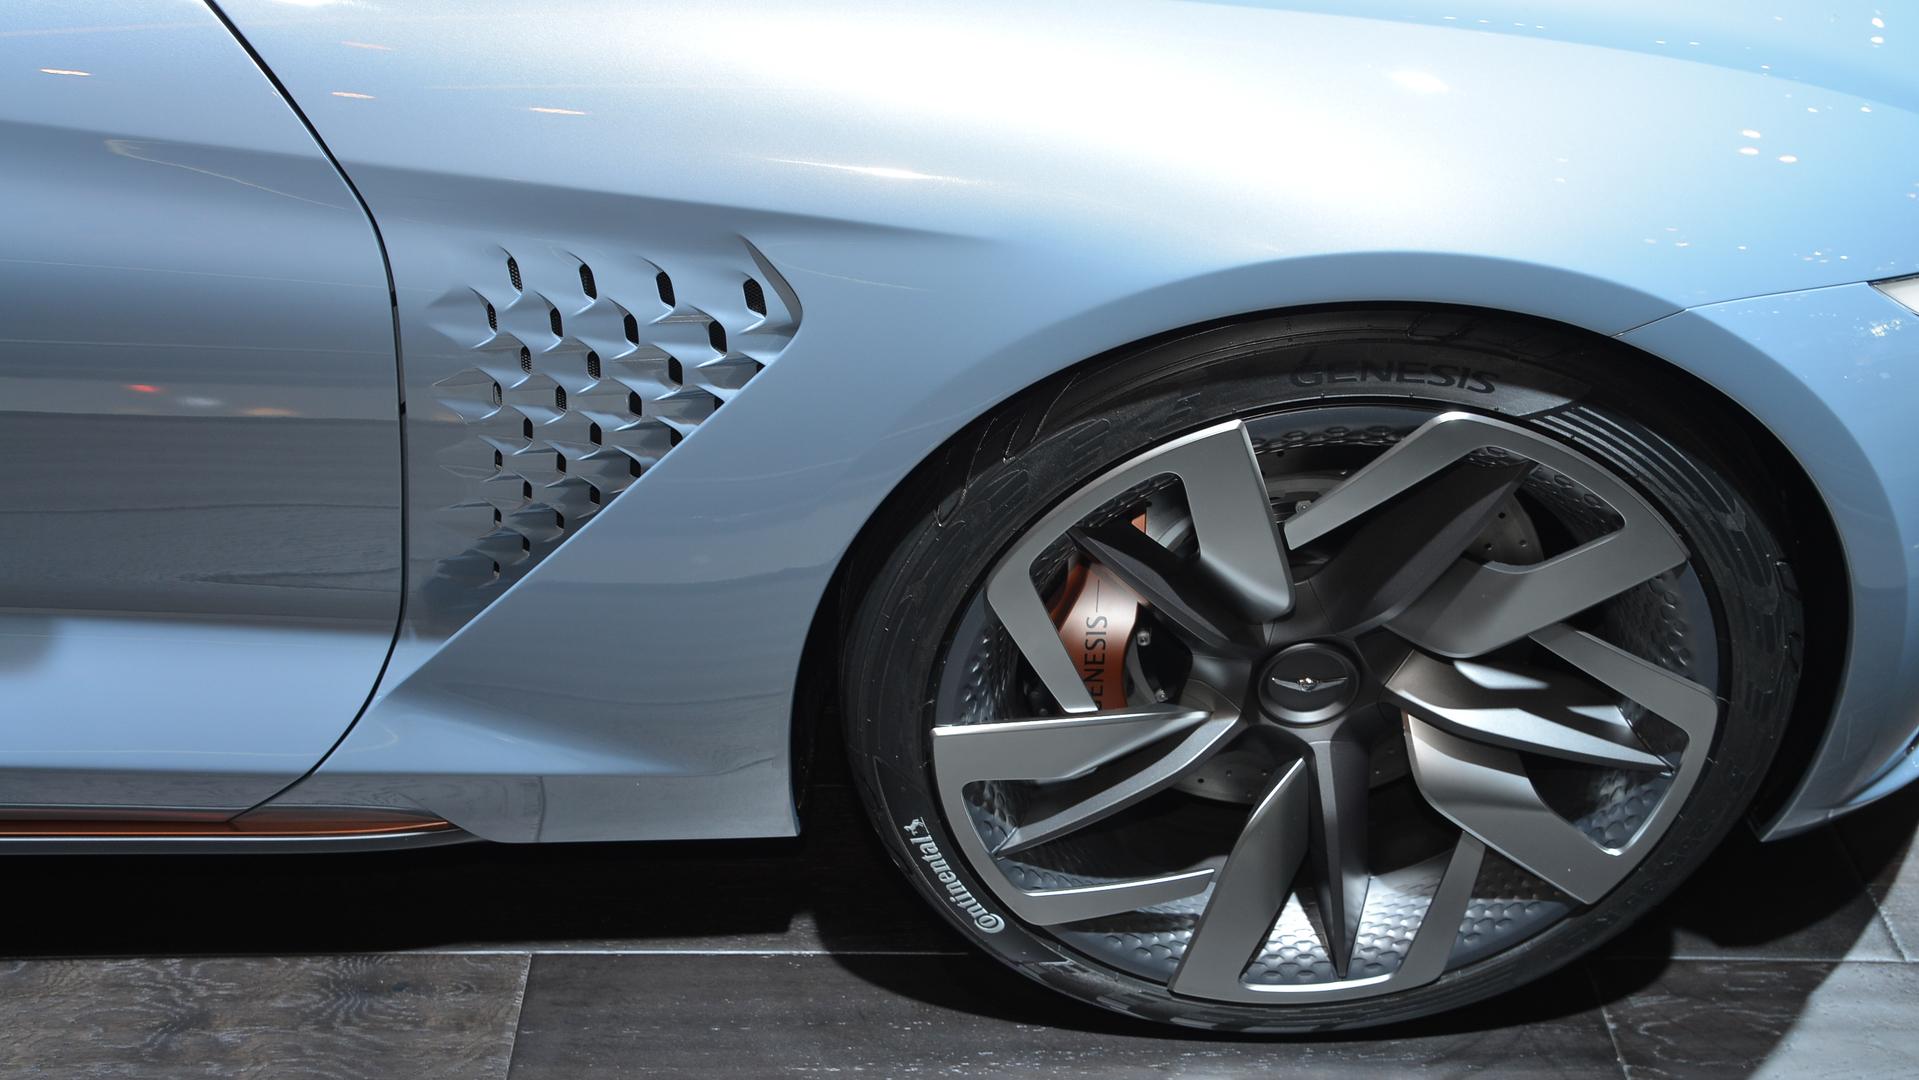 Genesis luxury EV planned by Hyundai